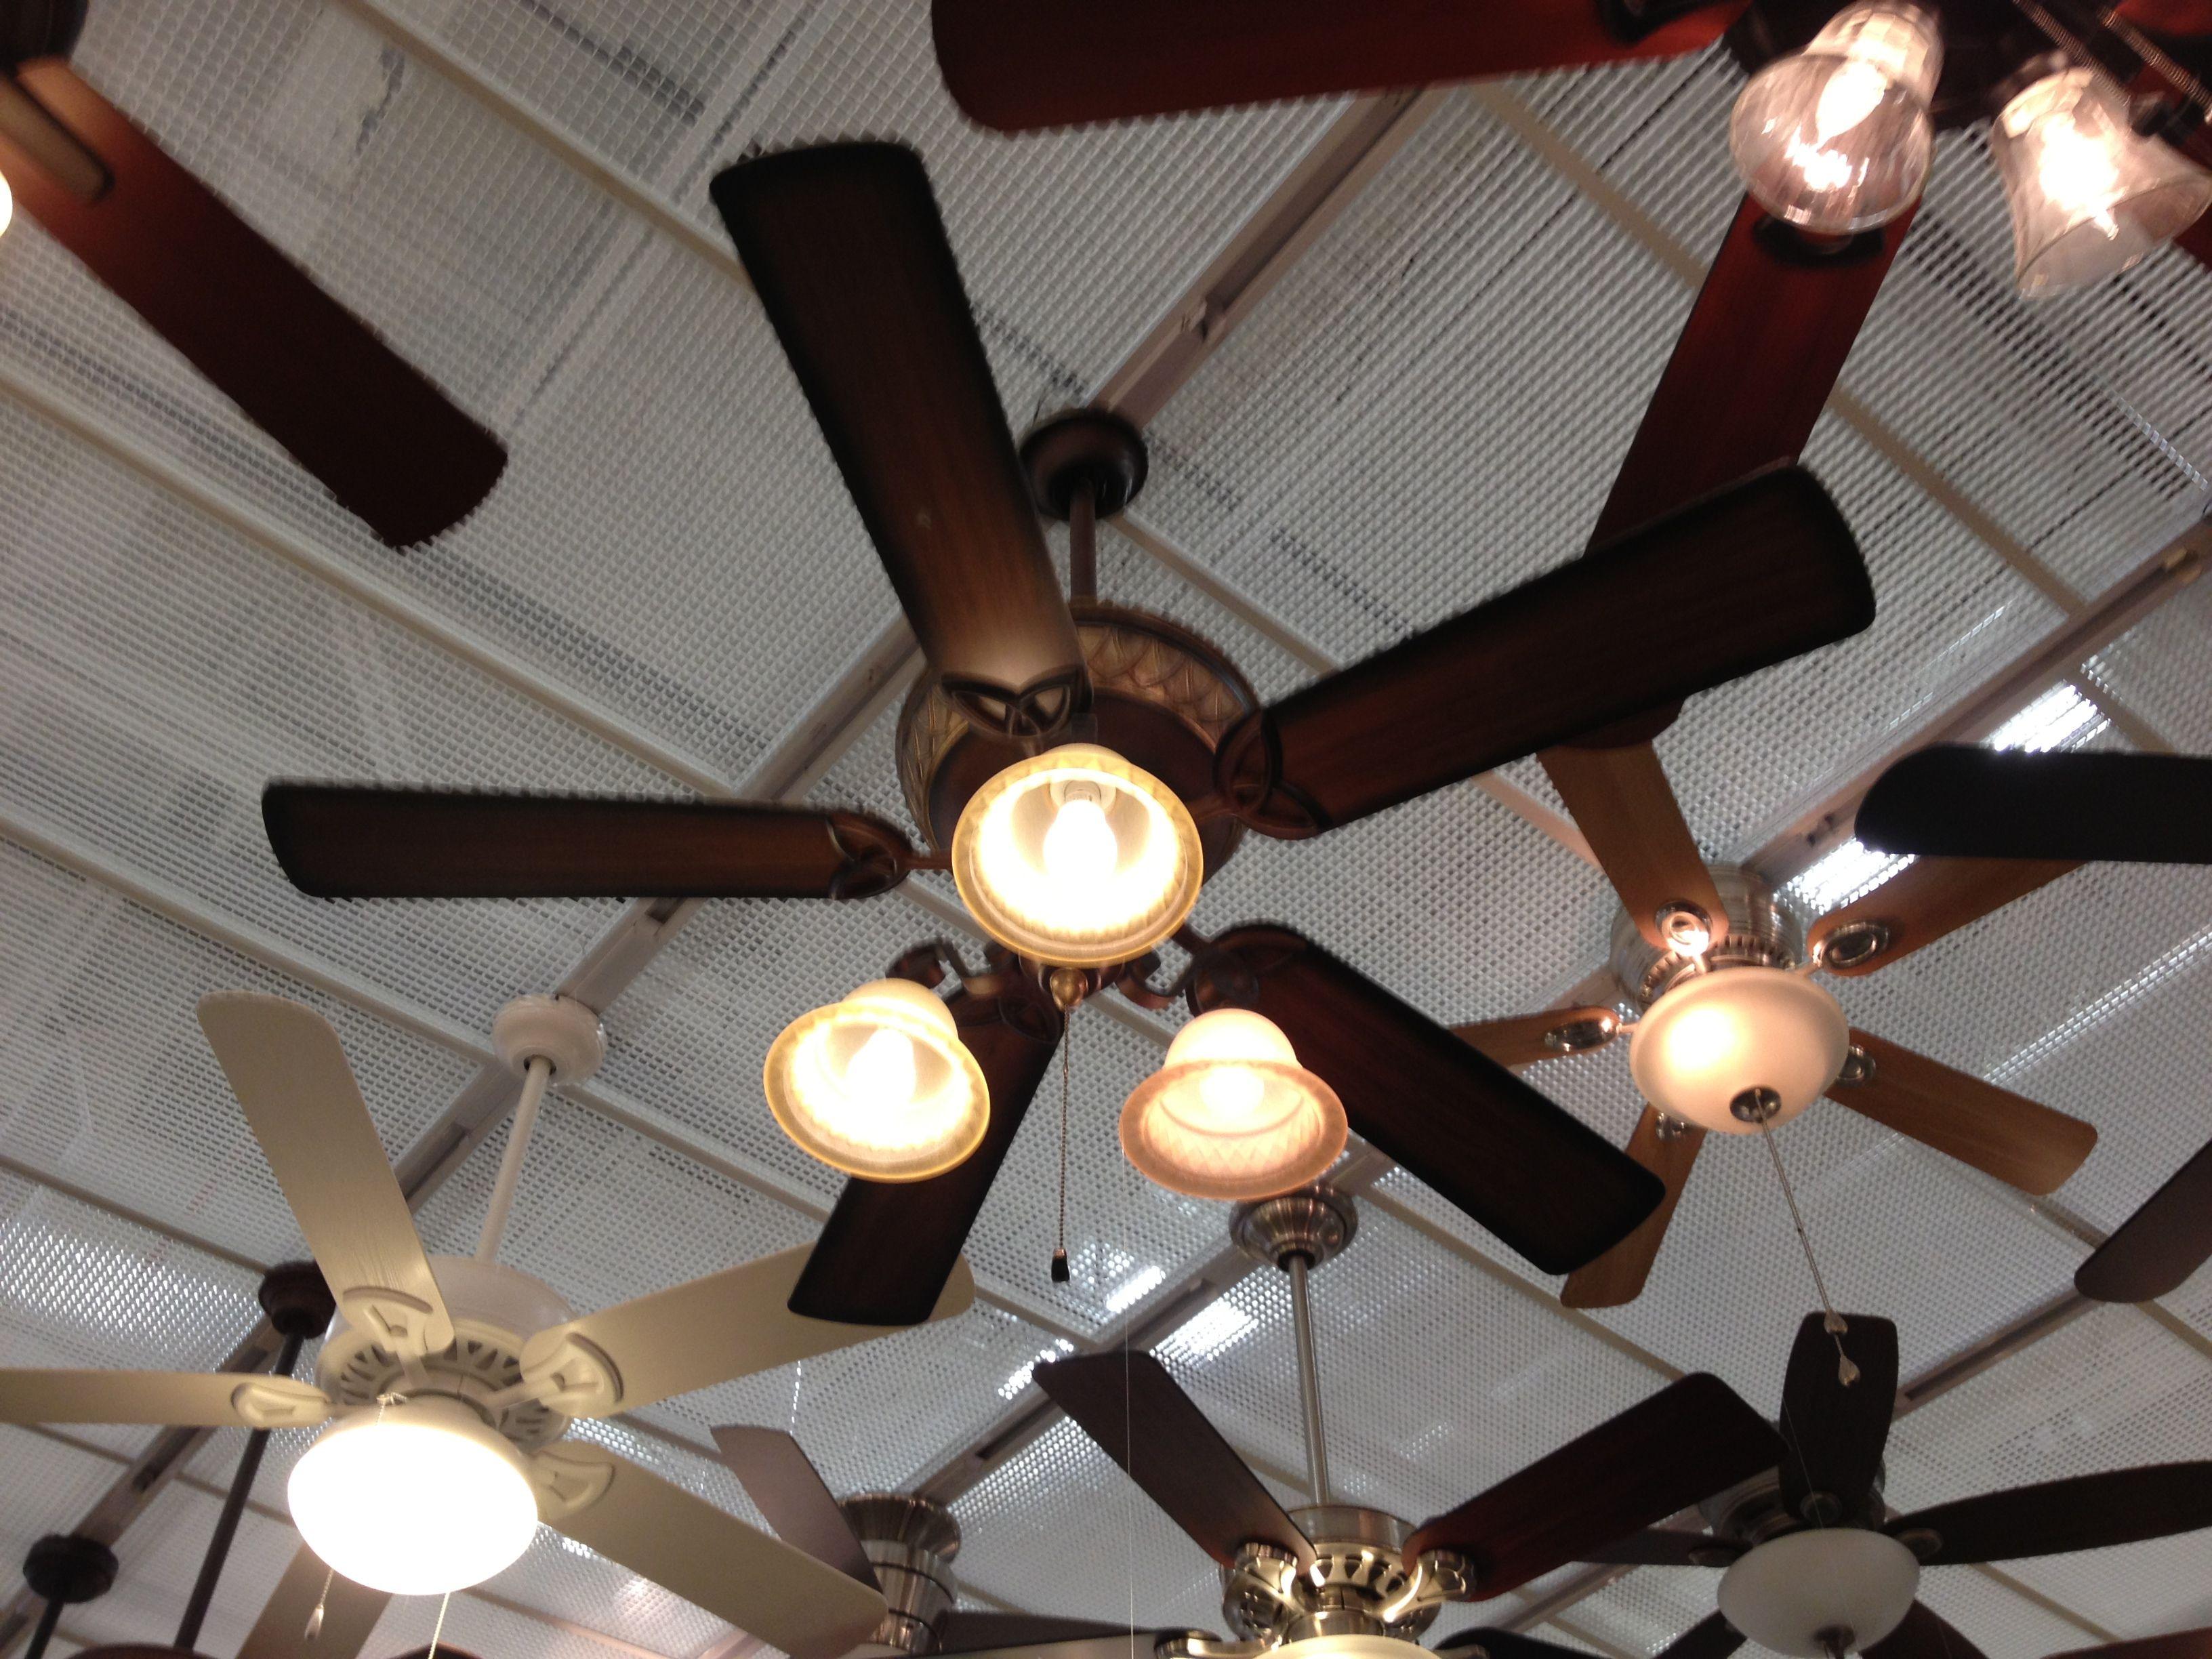 living room fans lowes decor inspiration traditional ceiling fan design pinterest